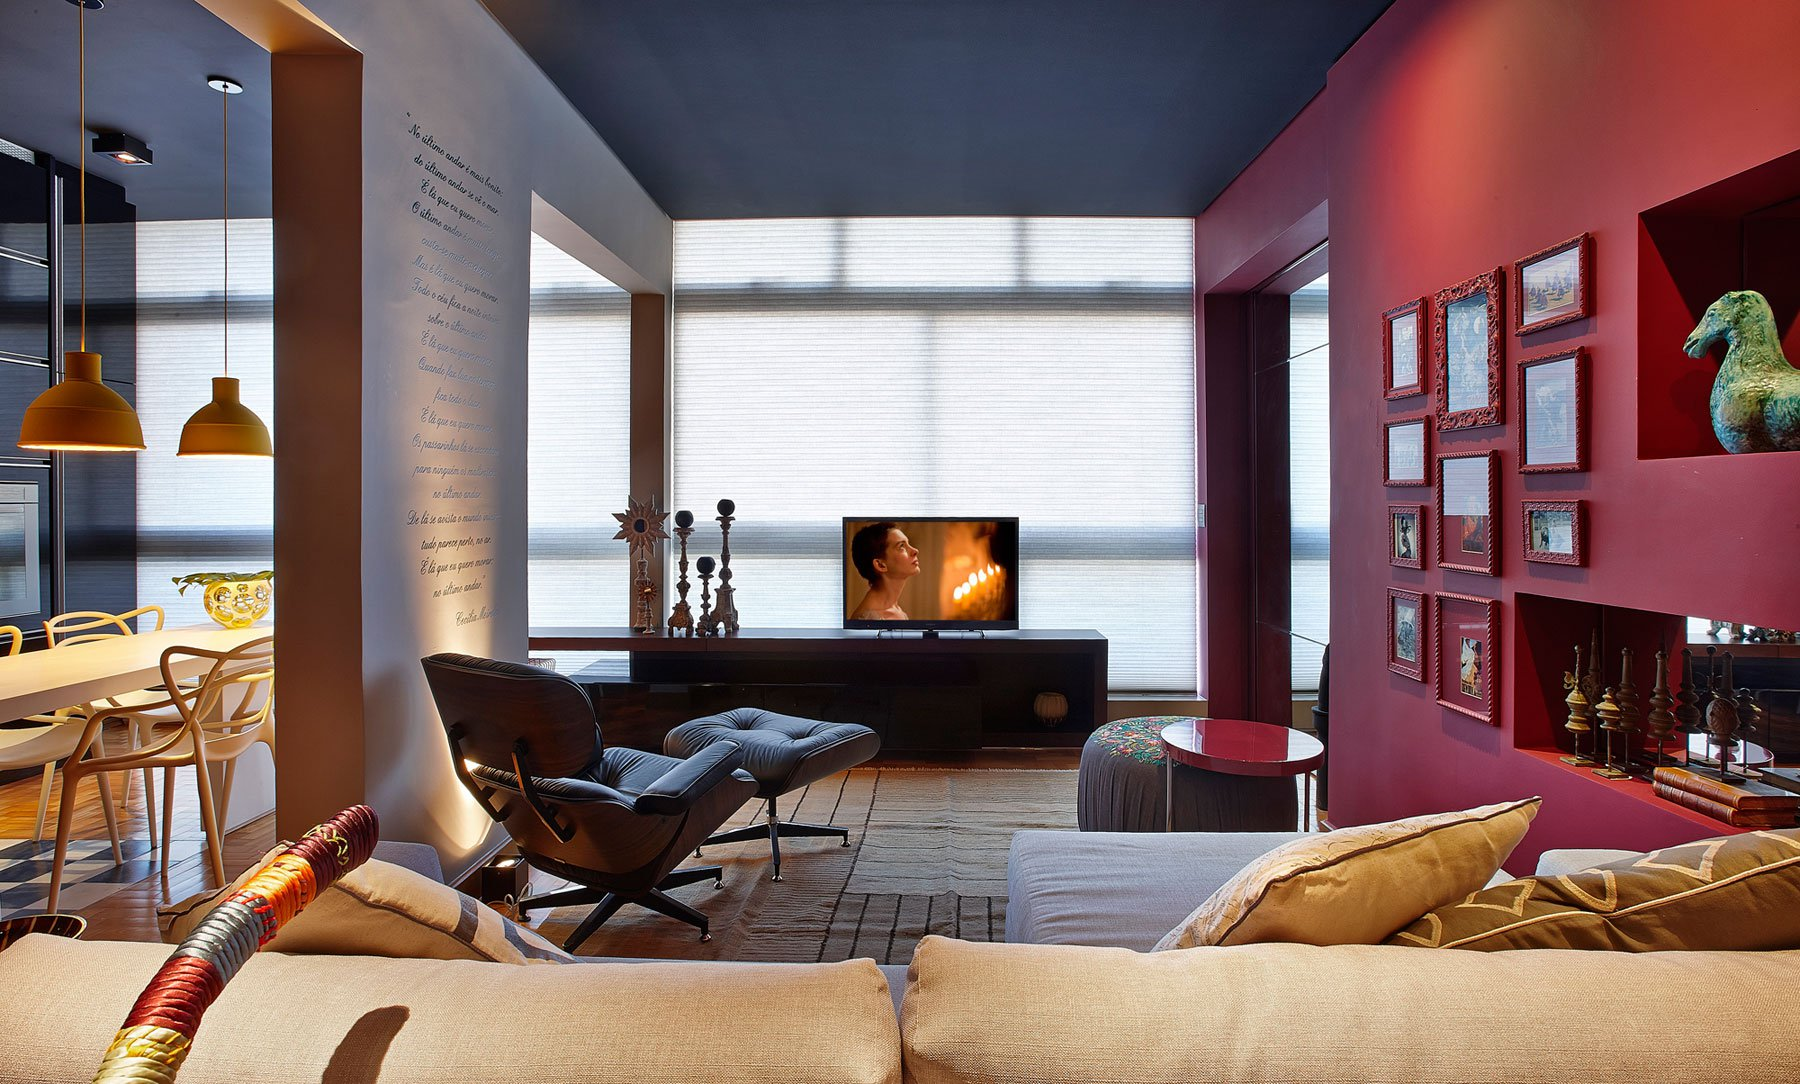 Apartment-in-Belo-Horizonte-03